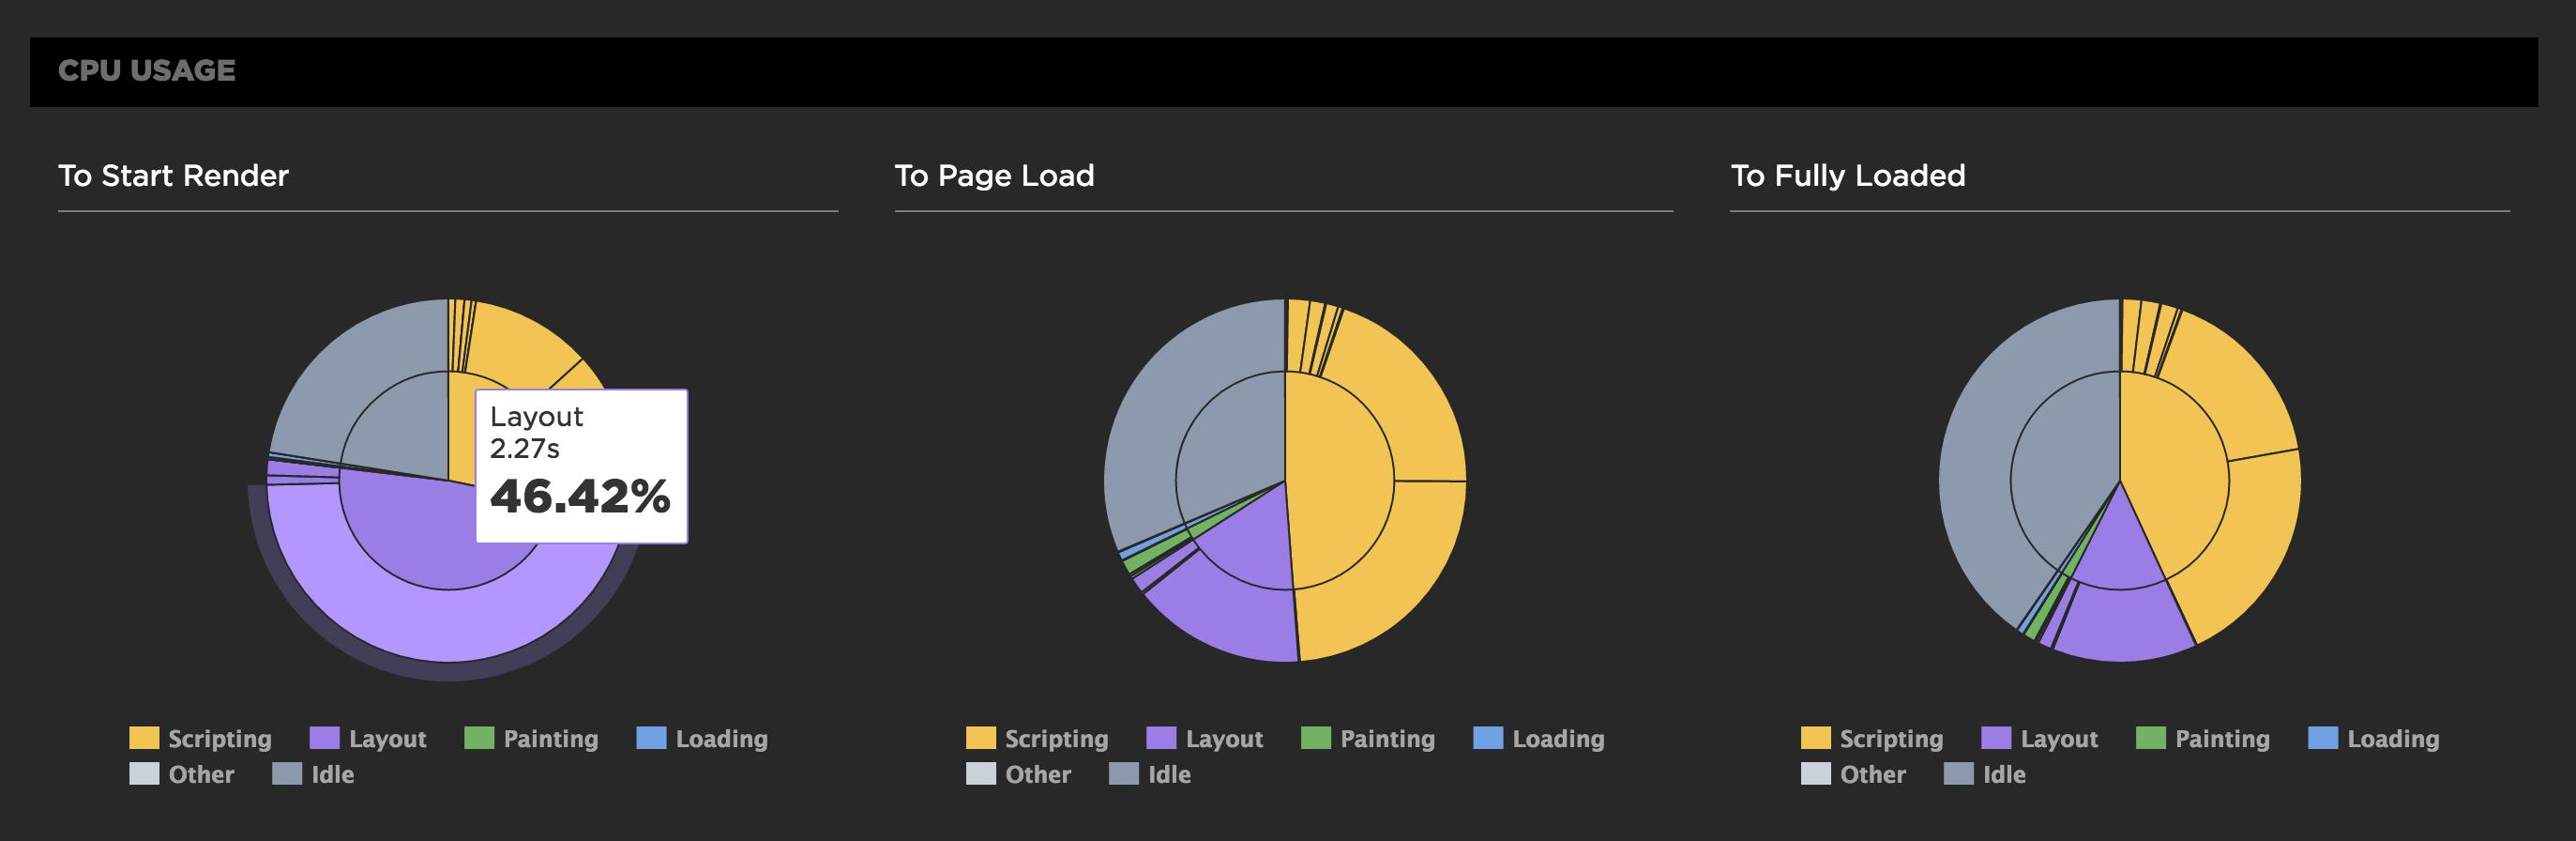 CPU pie charts